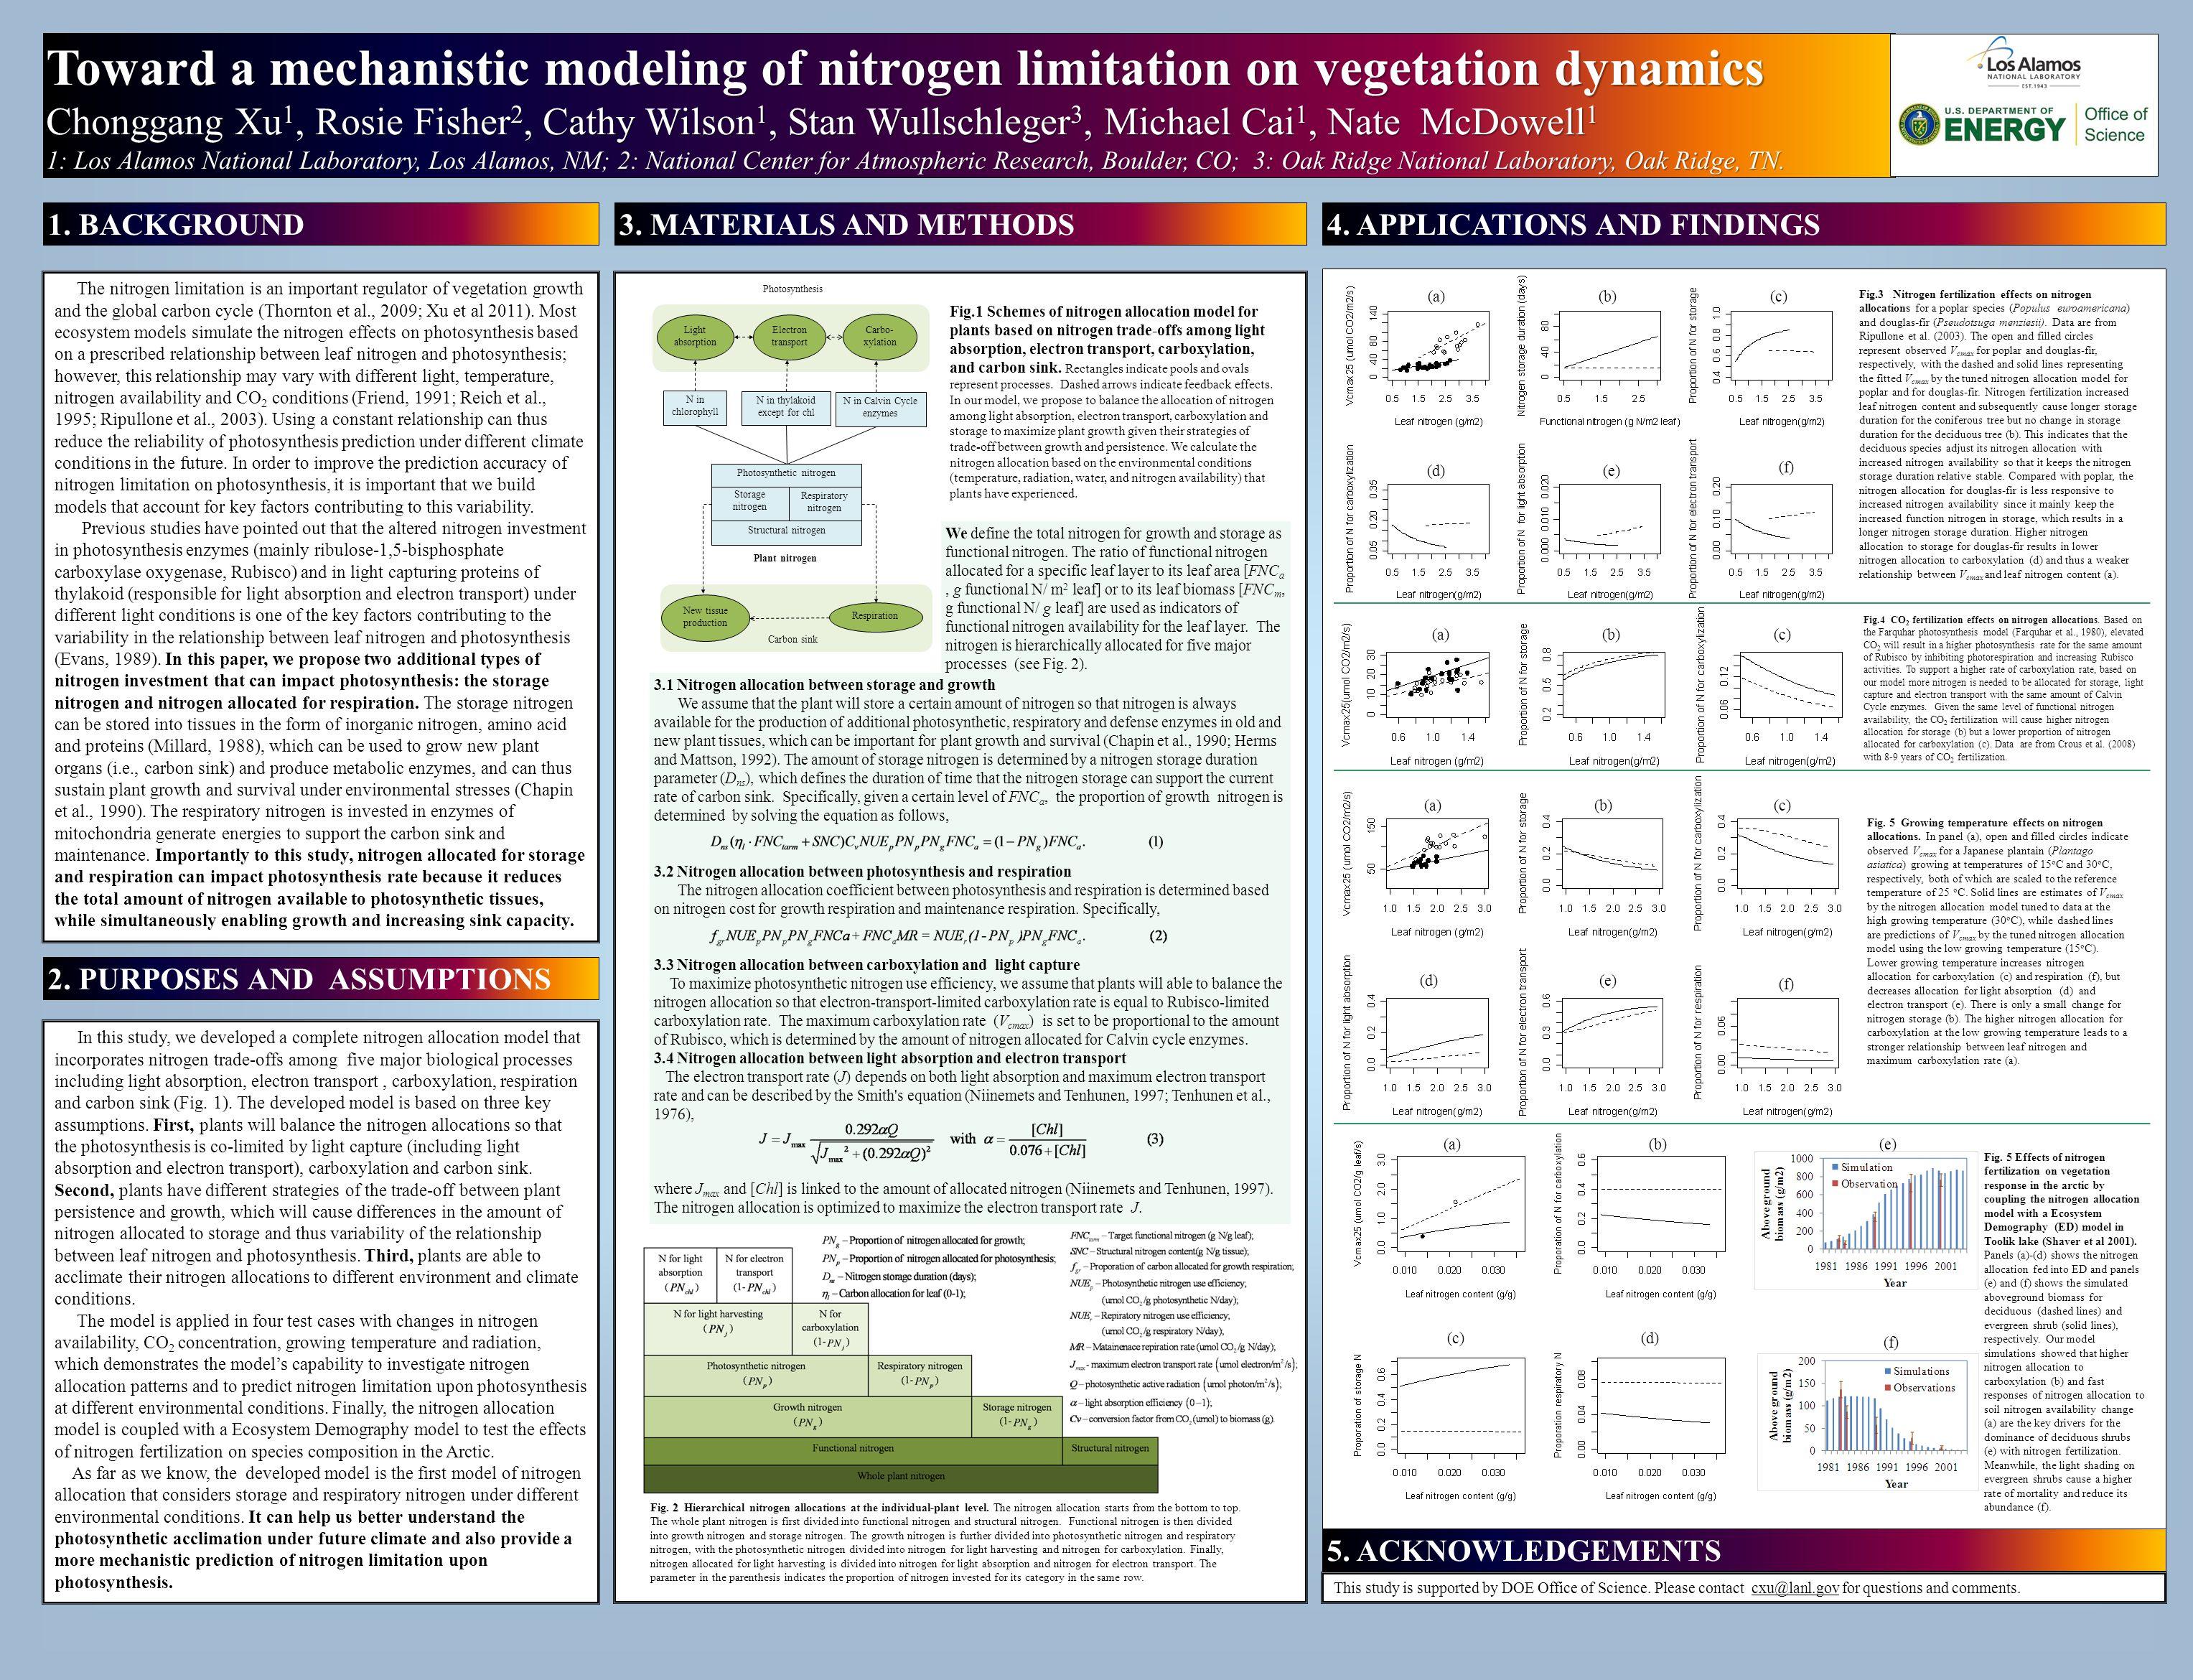 Toward a mechanistic modeling of nitrogen limitation on vegetation dynamics Chonggang Xu 1, Rosie Fisher 2, Cathy Wilson 1, Stan Wullschleger 3, Michael Cai 1, Nate McDowell 1 1: Los Alamos National Laboratory, Los Alamos, NM; 2: National Center for Atmospheric Research, Boulder, CO; 3: Oak Ridge National Laboratory, Oak Ridge, TN.